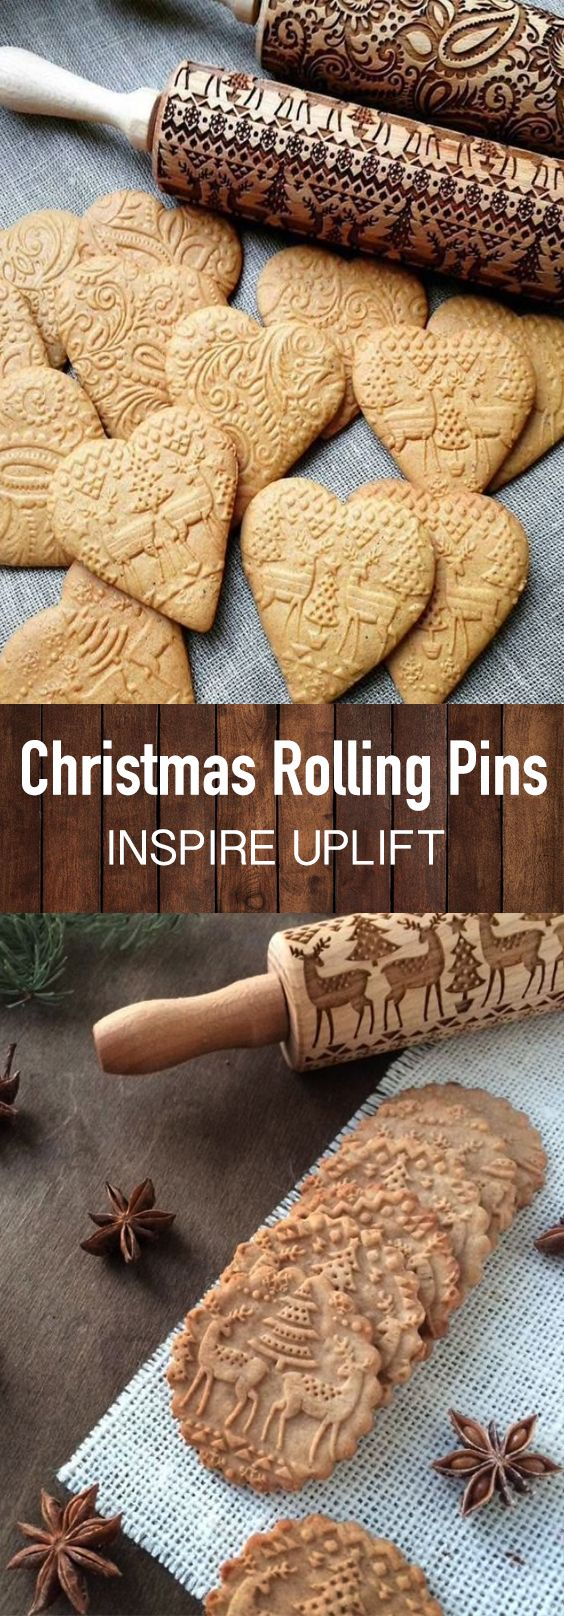 Christmas 3D Rolling Pin | Christmas baking, Christmas cooking